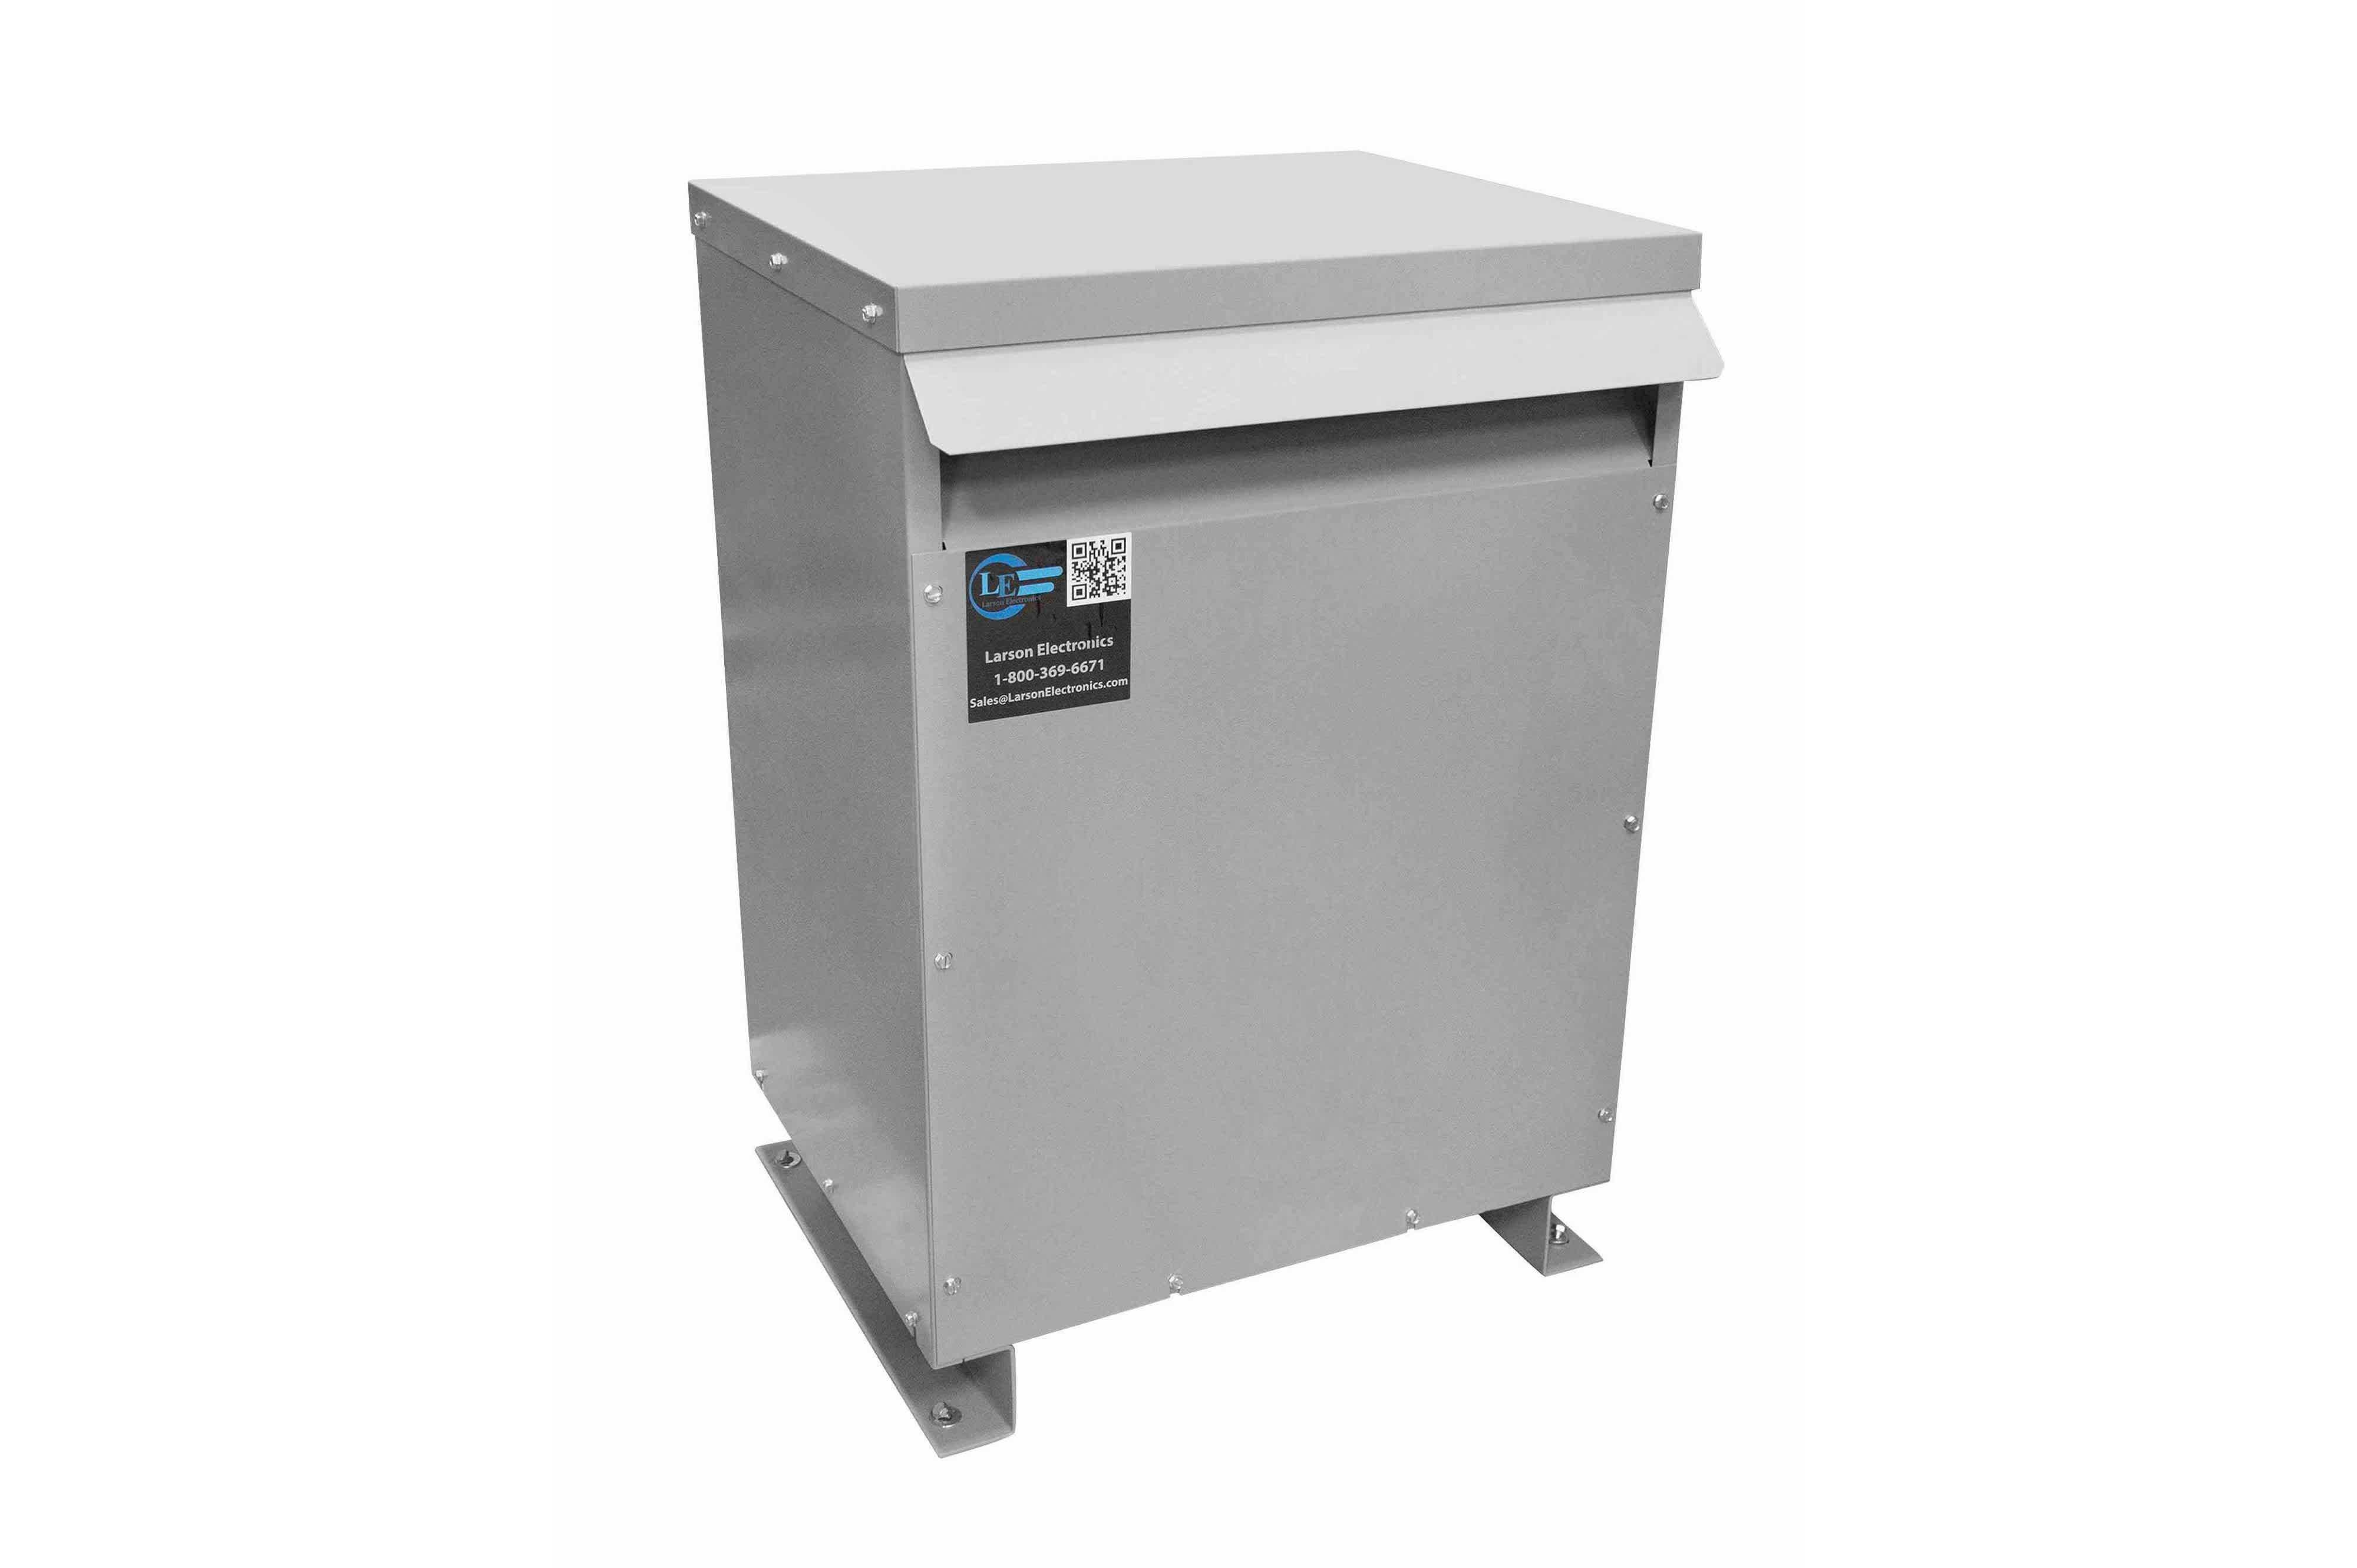 115 kVA 3PH Isolation Transformer, 380V Wye Primary, 208Y/120 Wye-N Secondary, N3R, Ventilated, 60 Hz